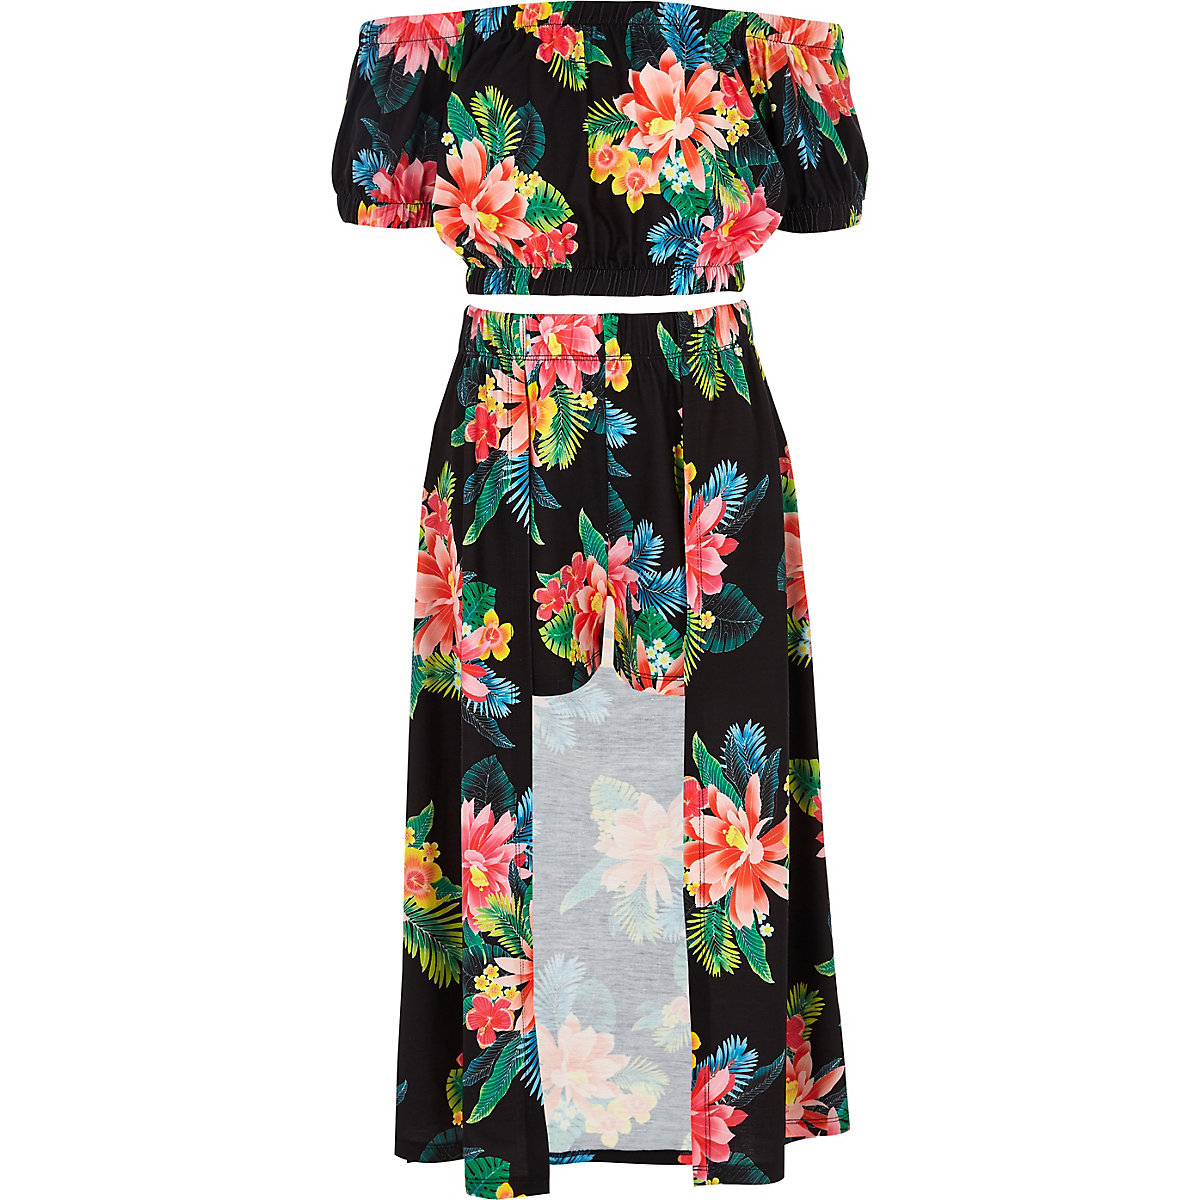 Girls black floral bardot crop top outfit